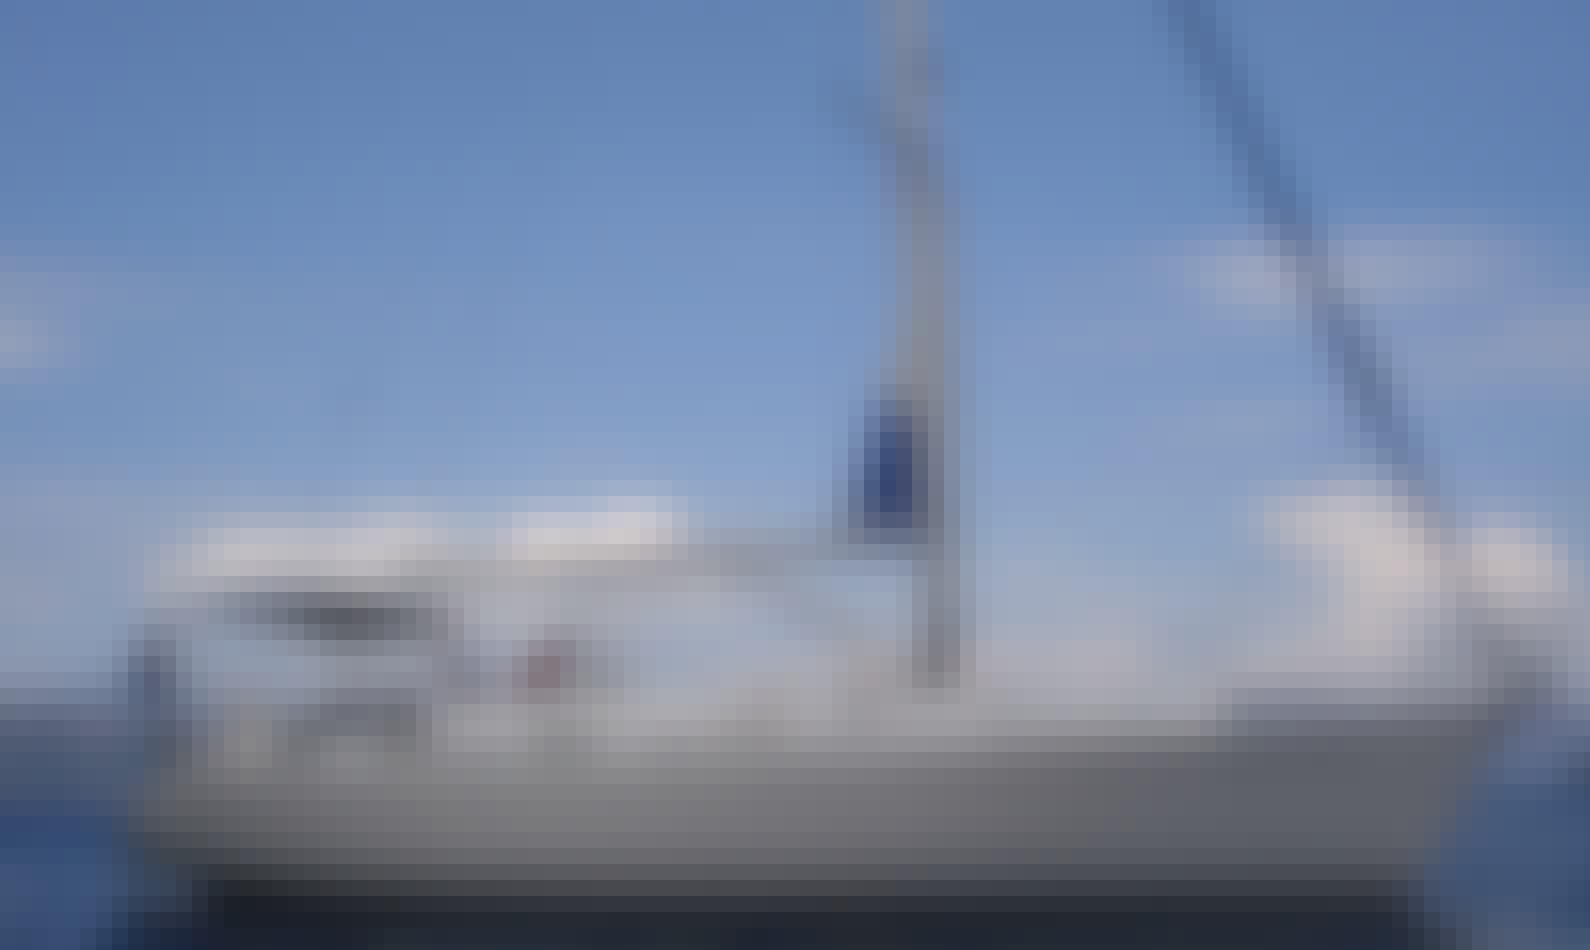 Bavaria 40 - Yacht Charter in Marmaris